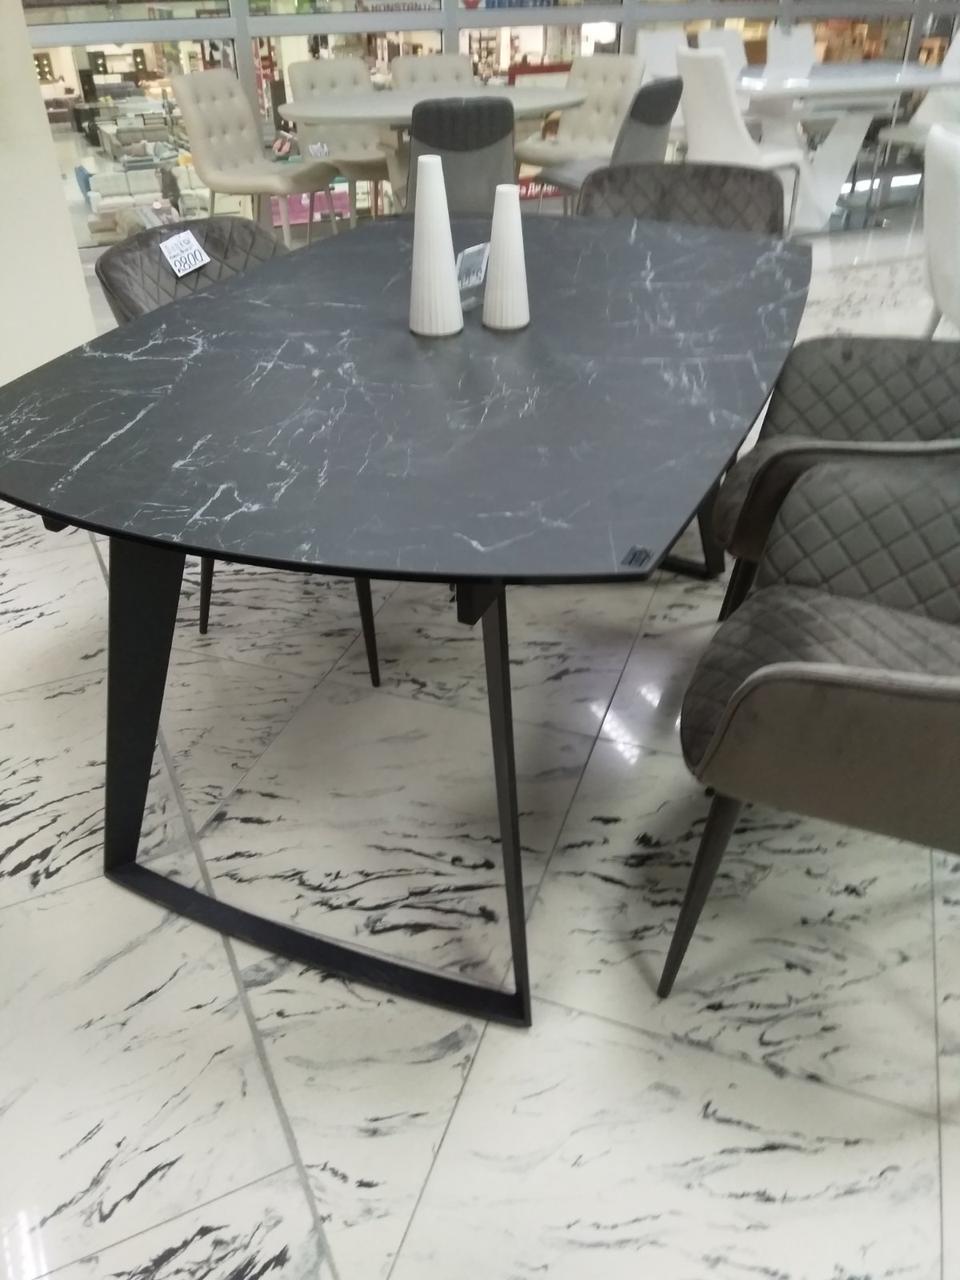 Стол обеденный CALGARY (Калгари) керамика черный под мрамор 160/210 от Niсolas